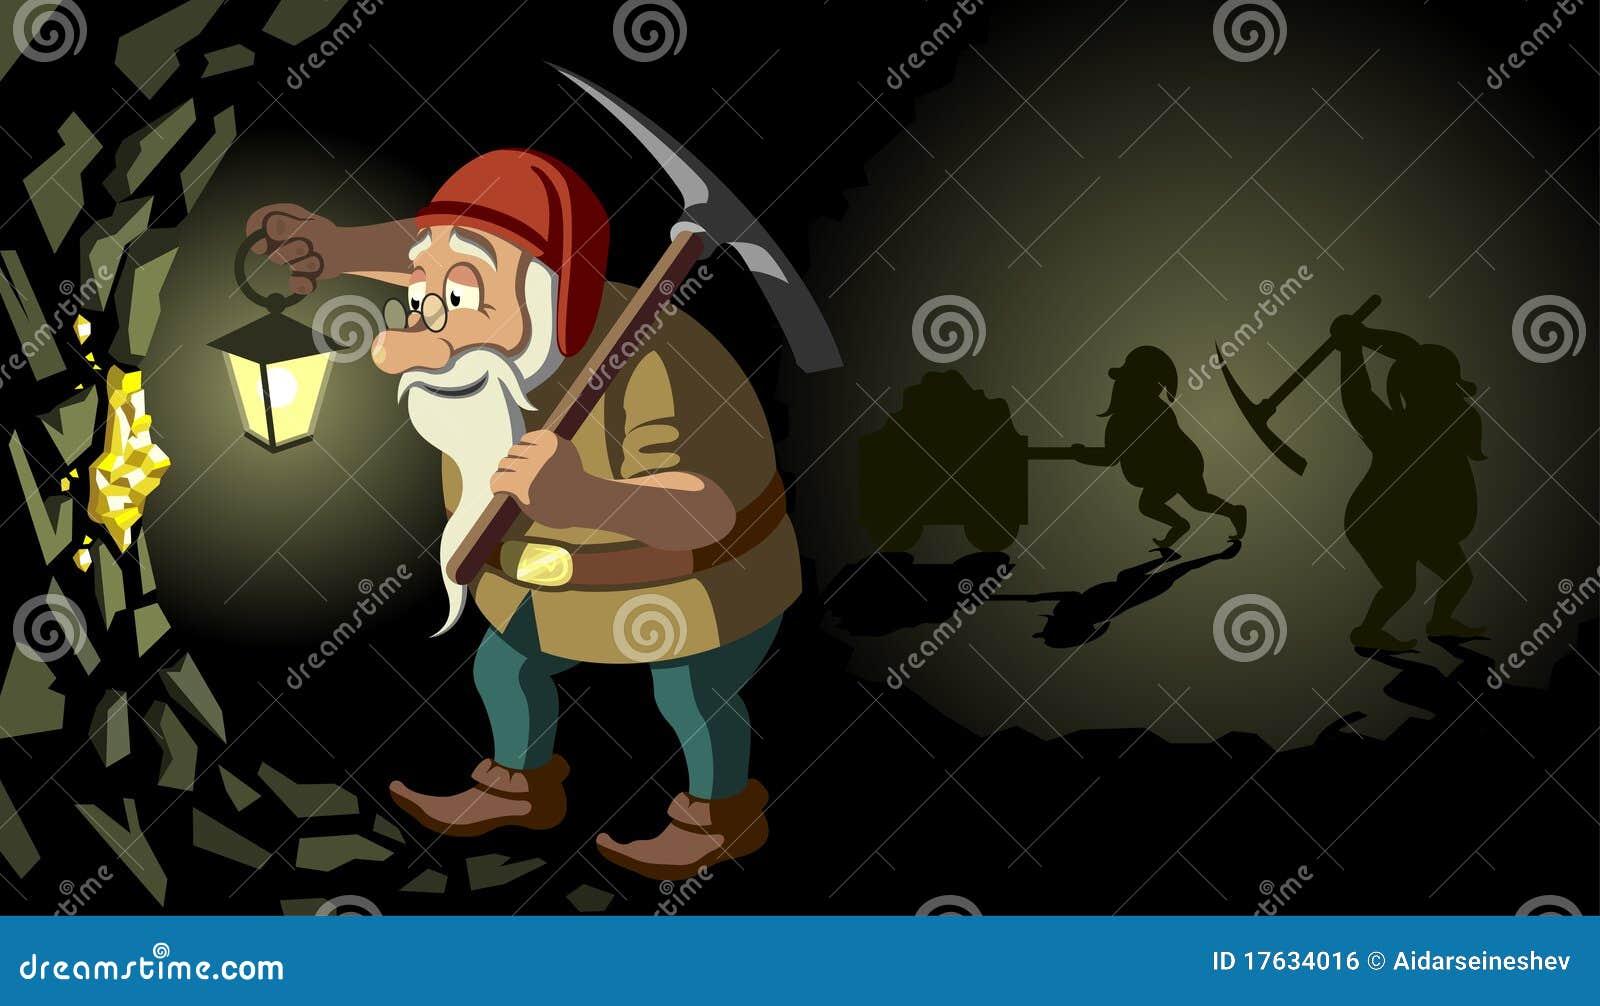 gnome-17634016.jpg